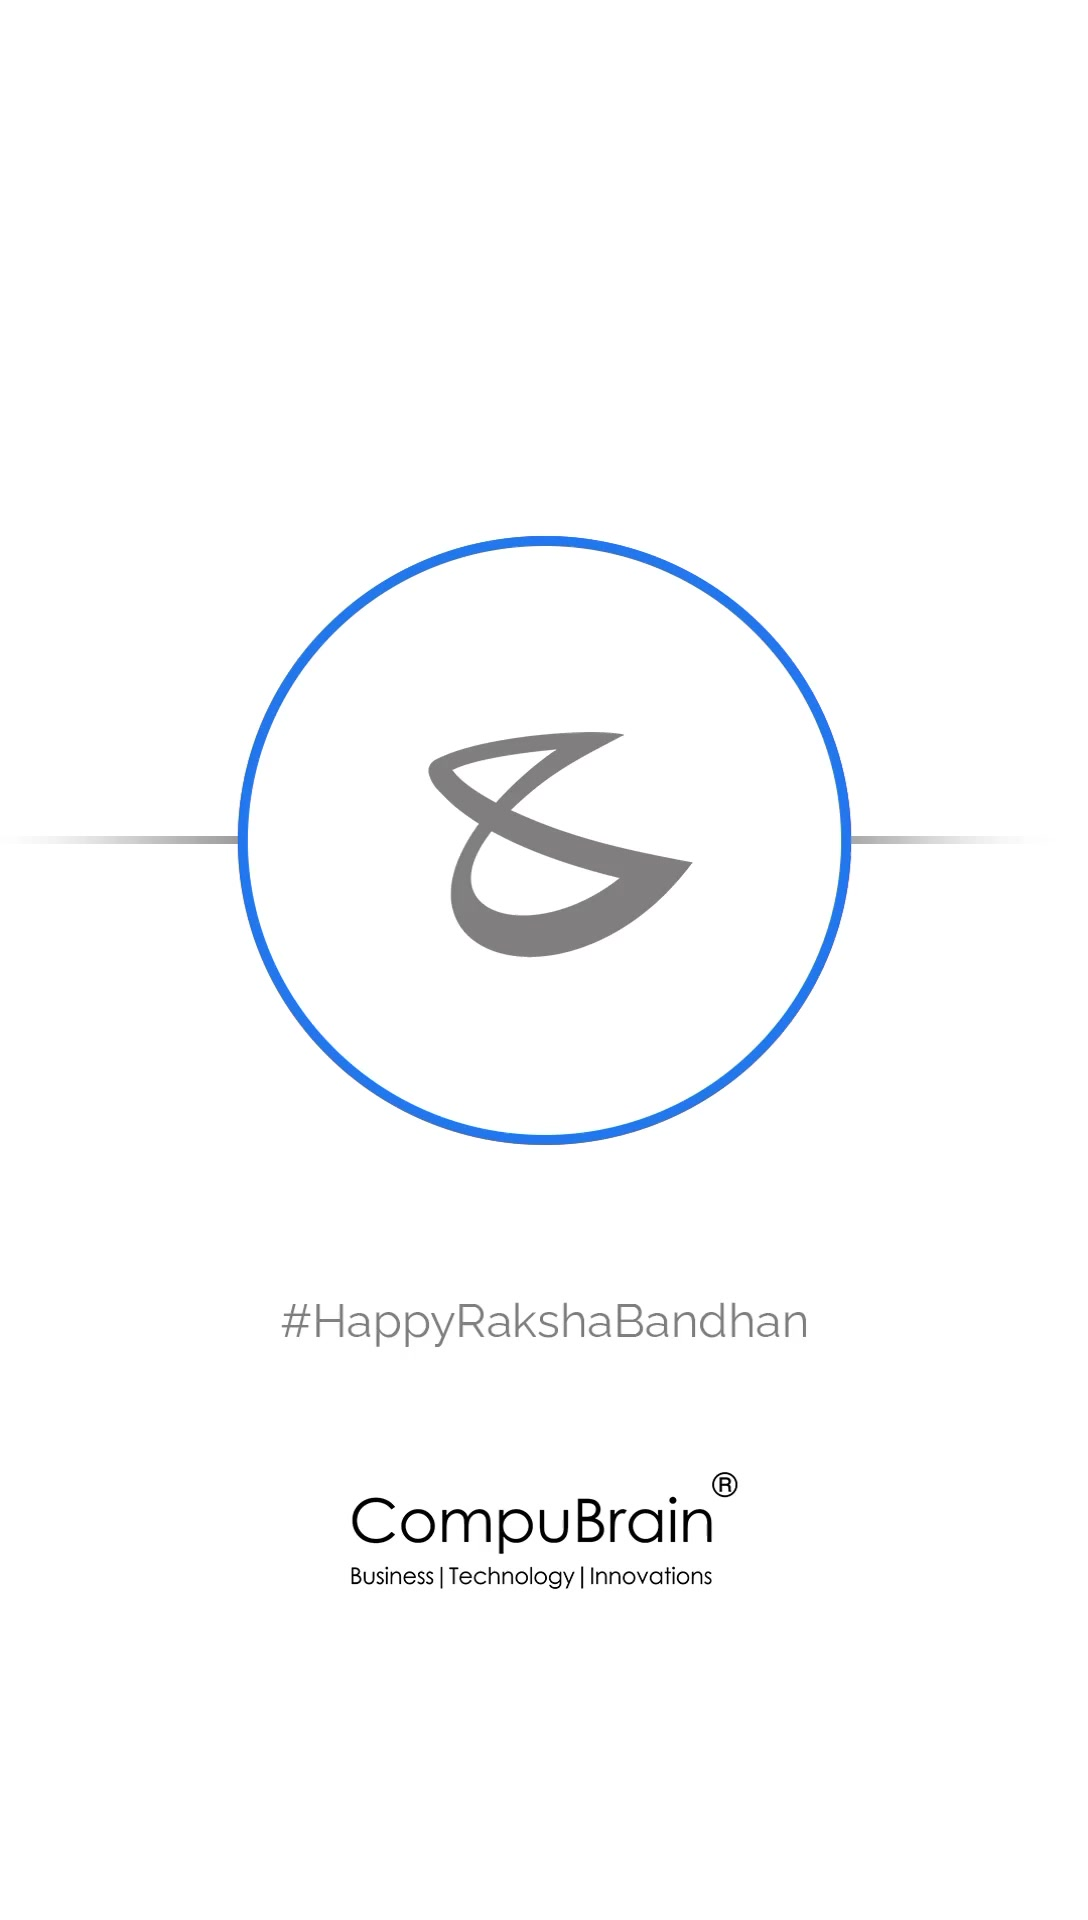 :: Happy Raksha Bandhan ::  #rakshabandhan #business #technology #innovations #indianfestival #india